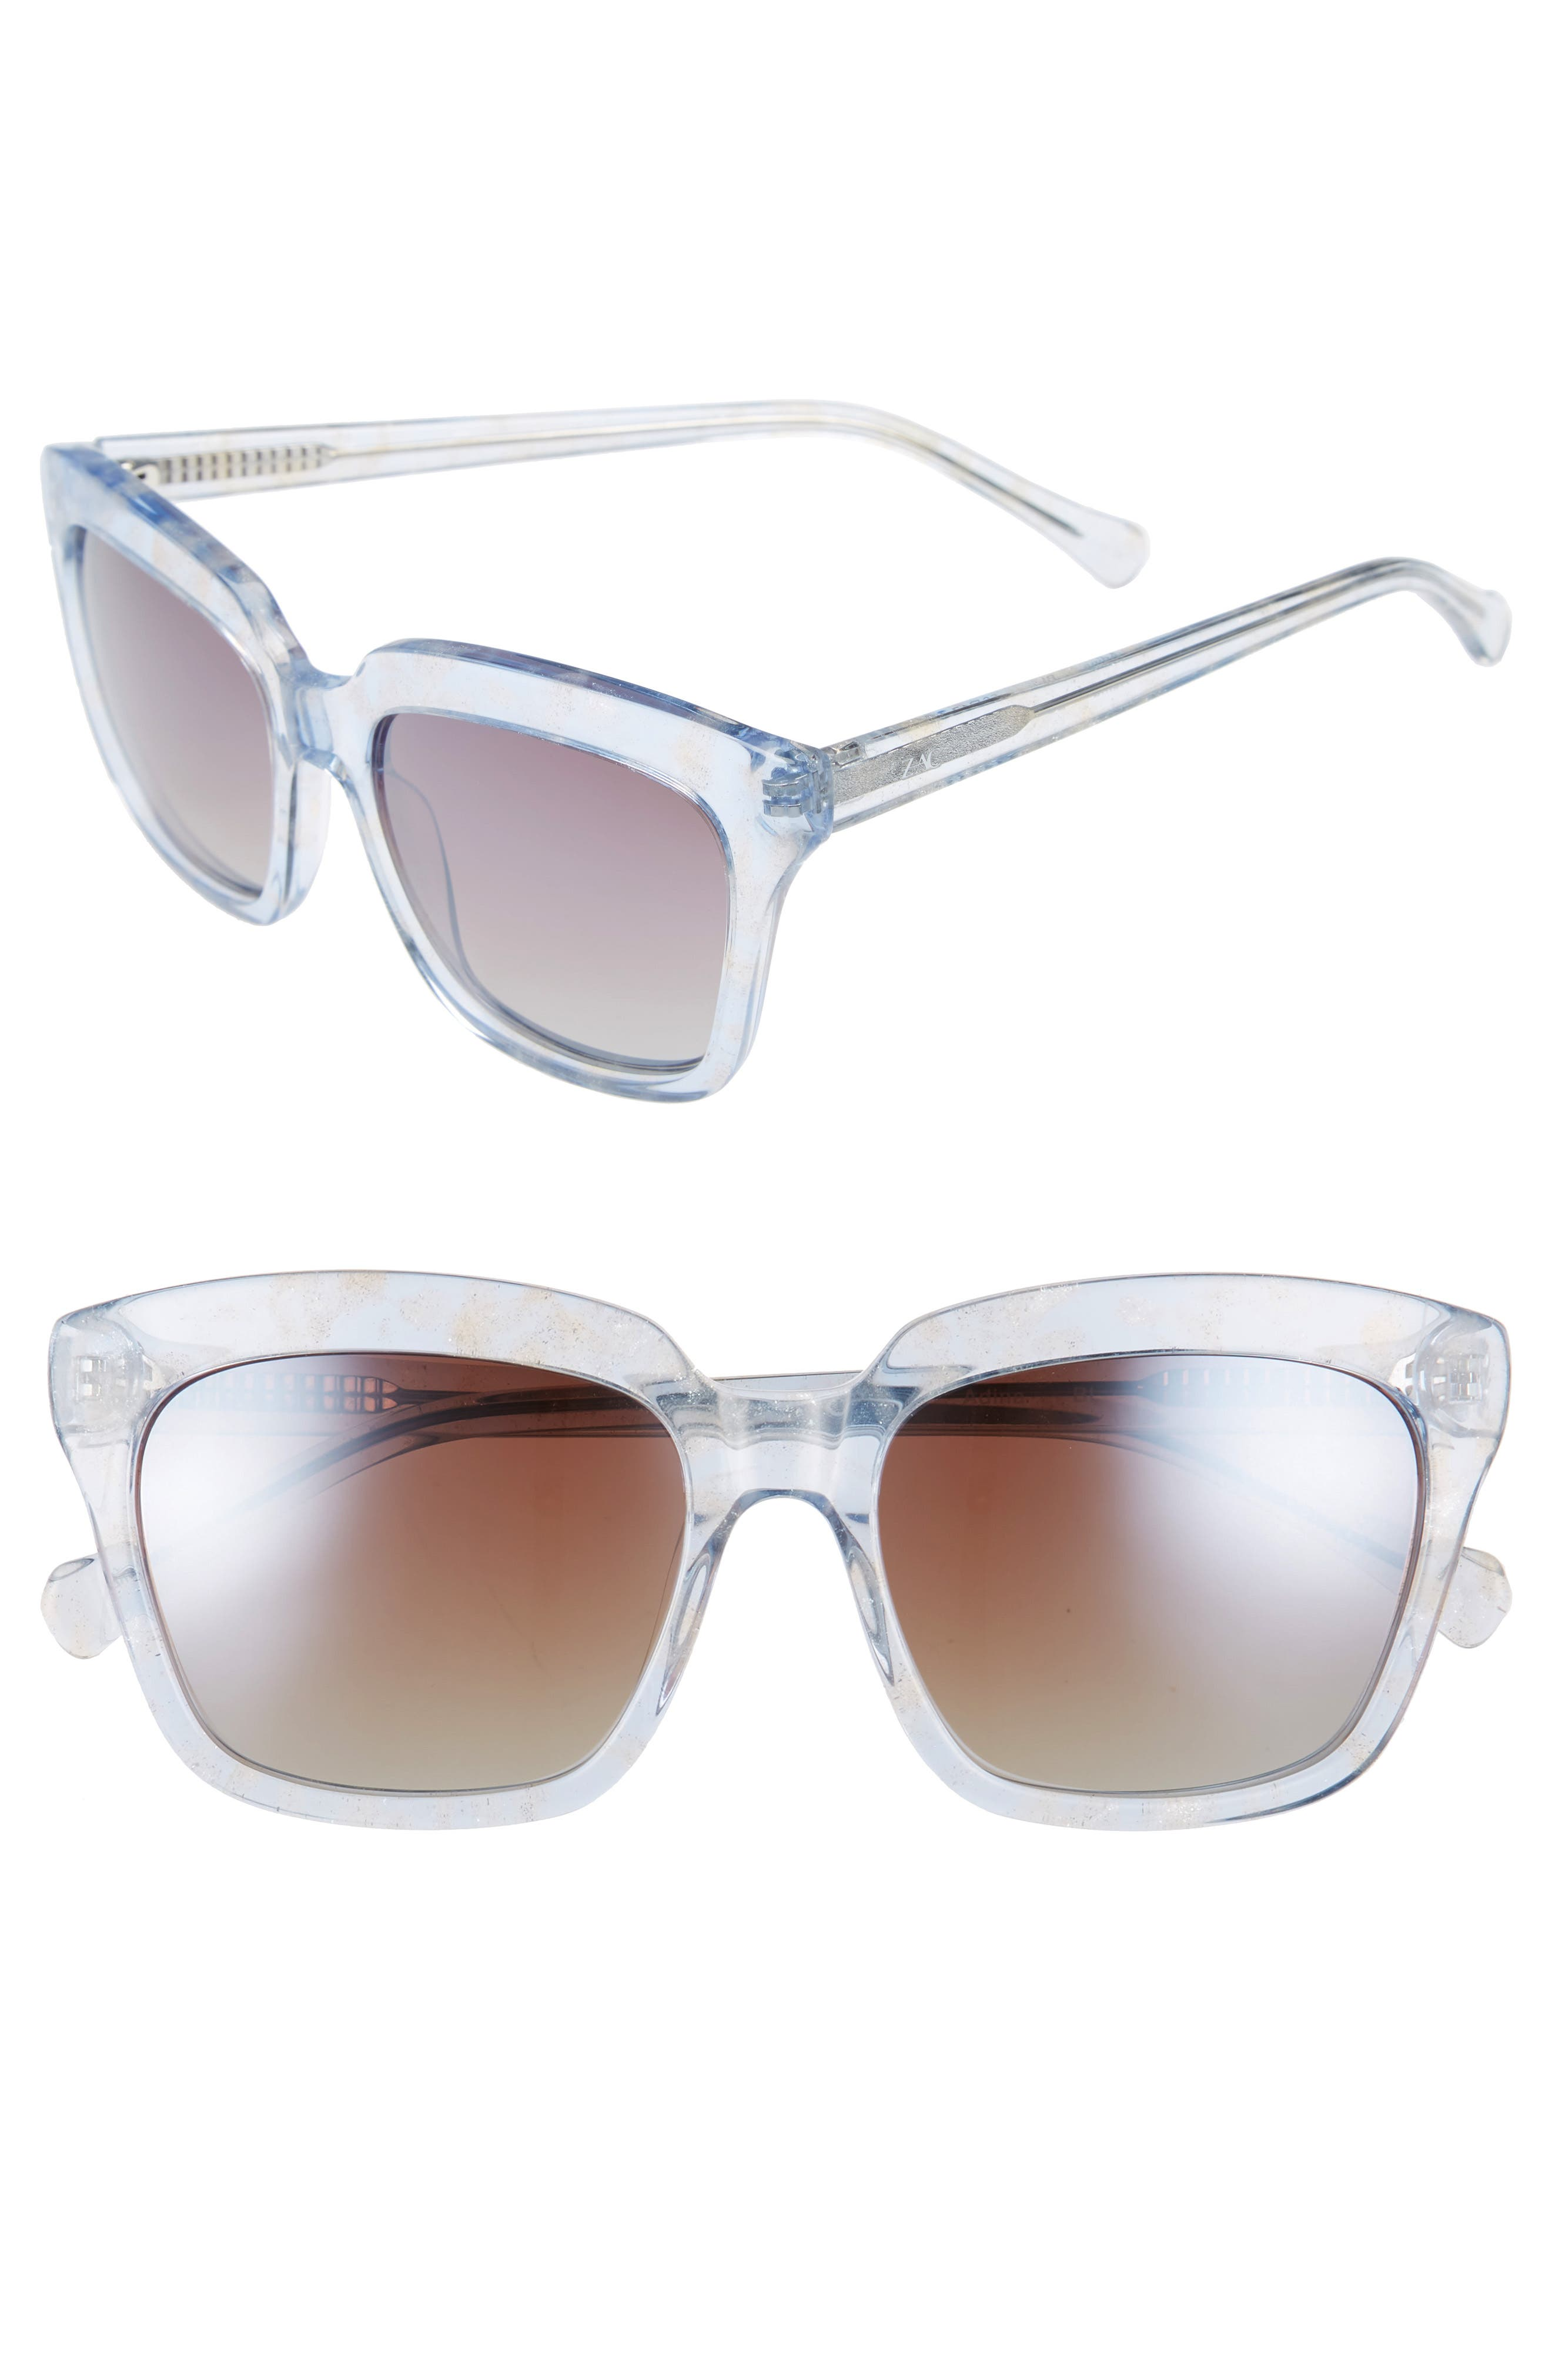 Adina 56mm Polarized Sunglasses,                             Main thumbnail 1, color,                             Blue Polar/ Greige